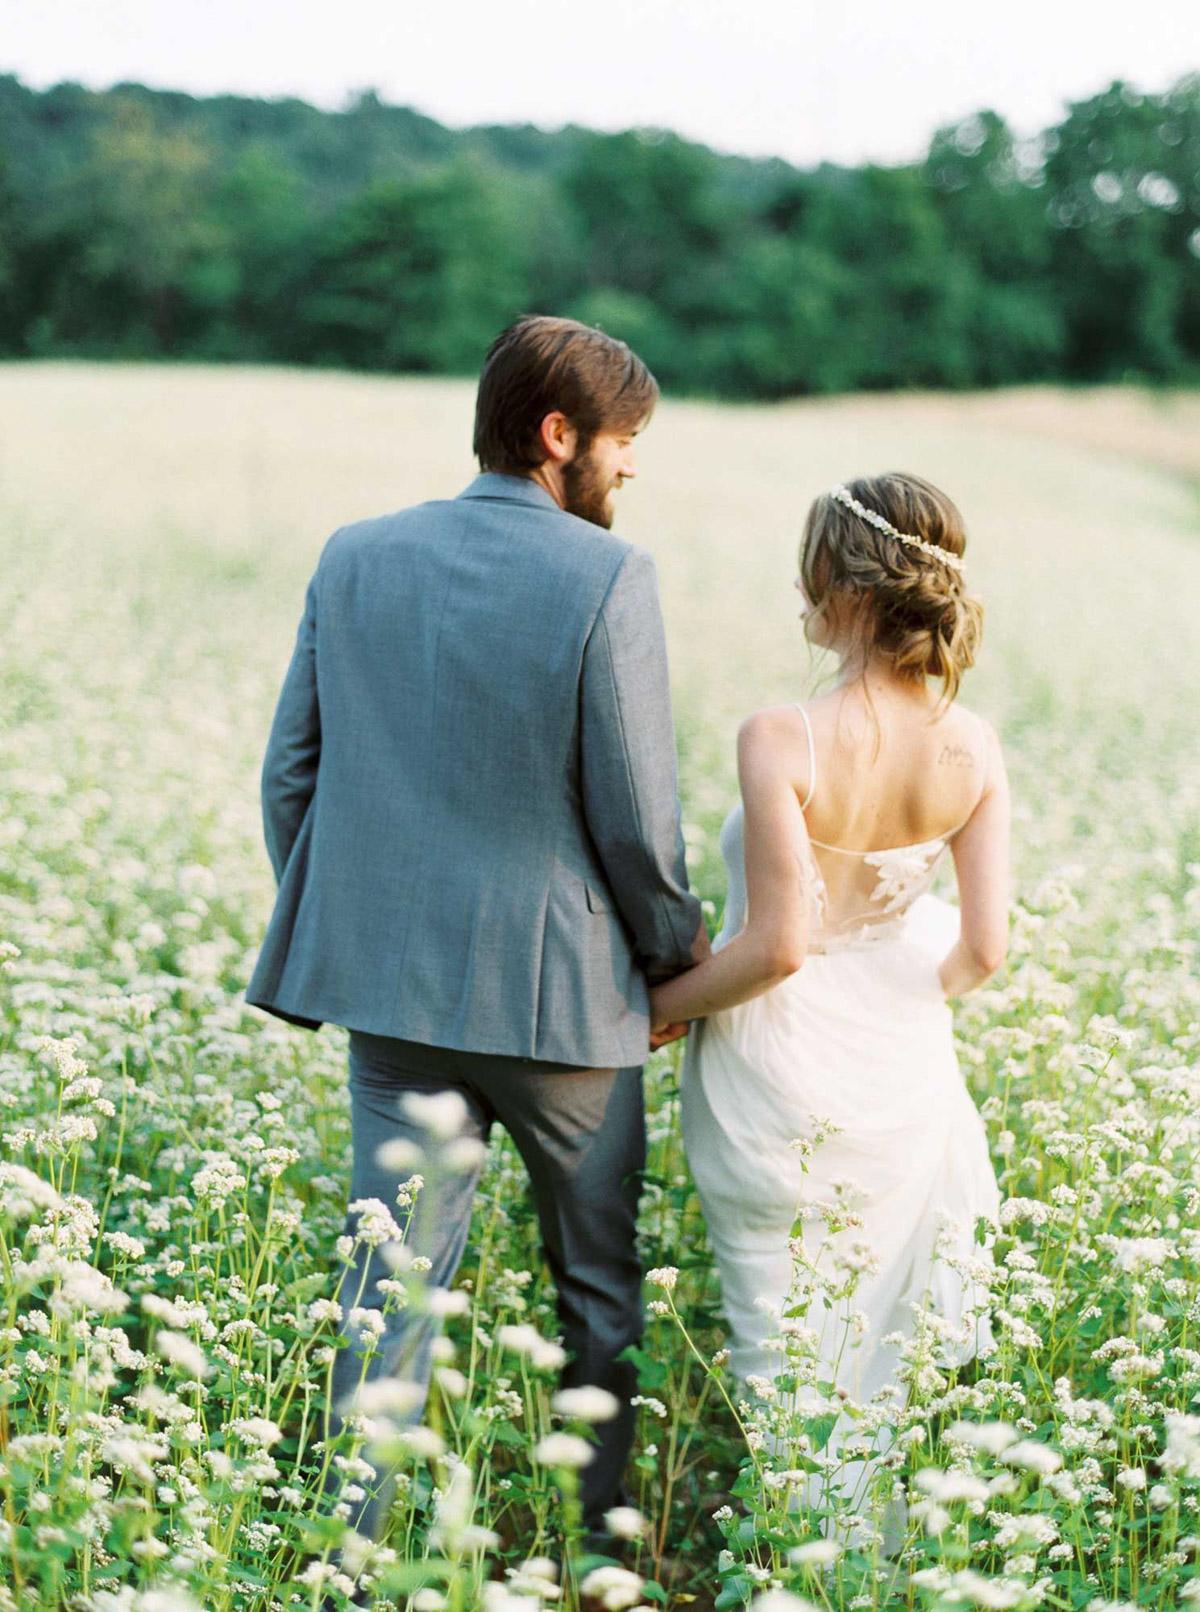 kayla-yestal-vineyard-bride-swish-list-woodland-weddings-niagara-wedding-editorial-35.jpg